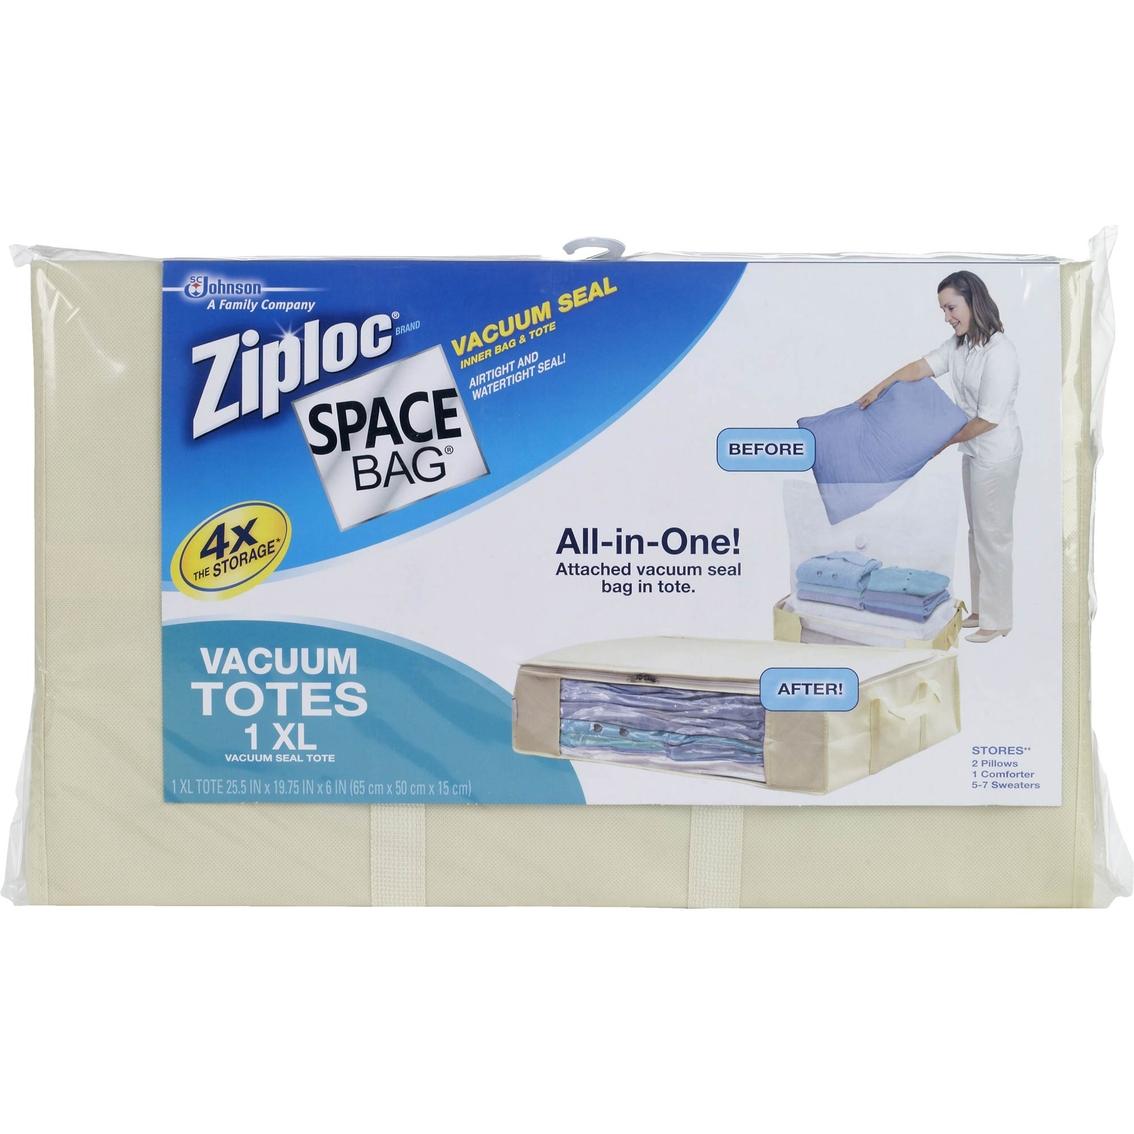 ziploc space bag extra large vacuum tote closet organization home appliances shop the. Black Bedroom Furniture Sets. Home Design Ideas